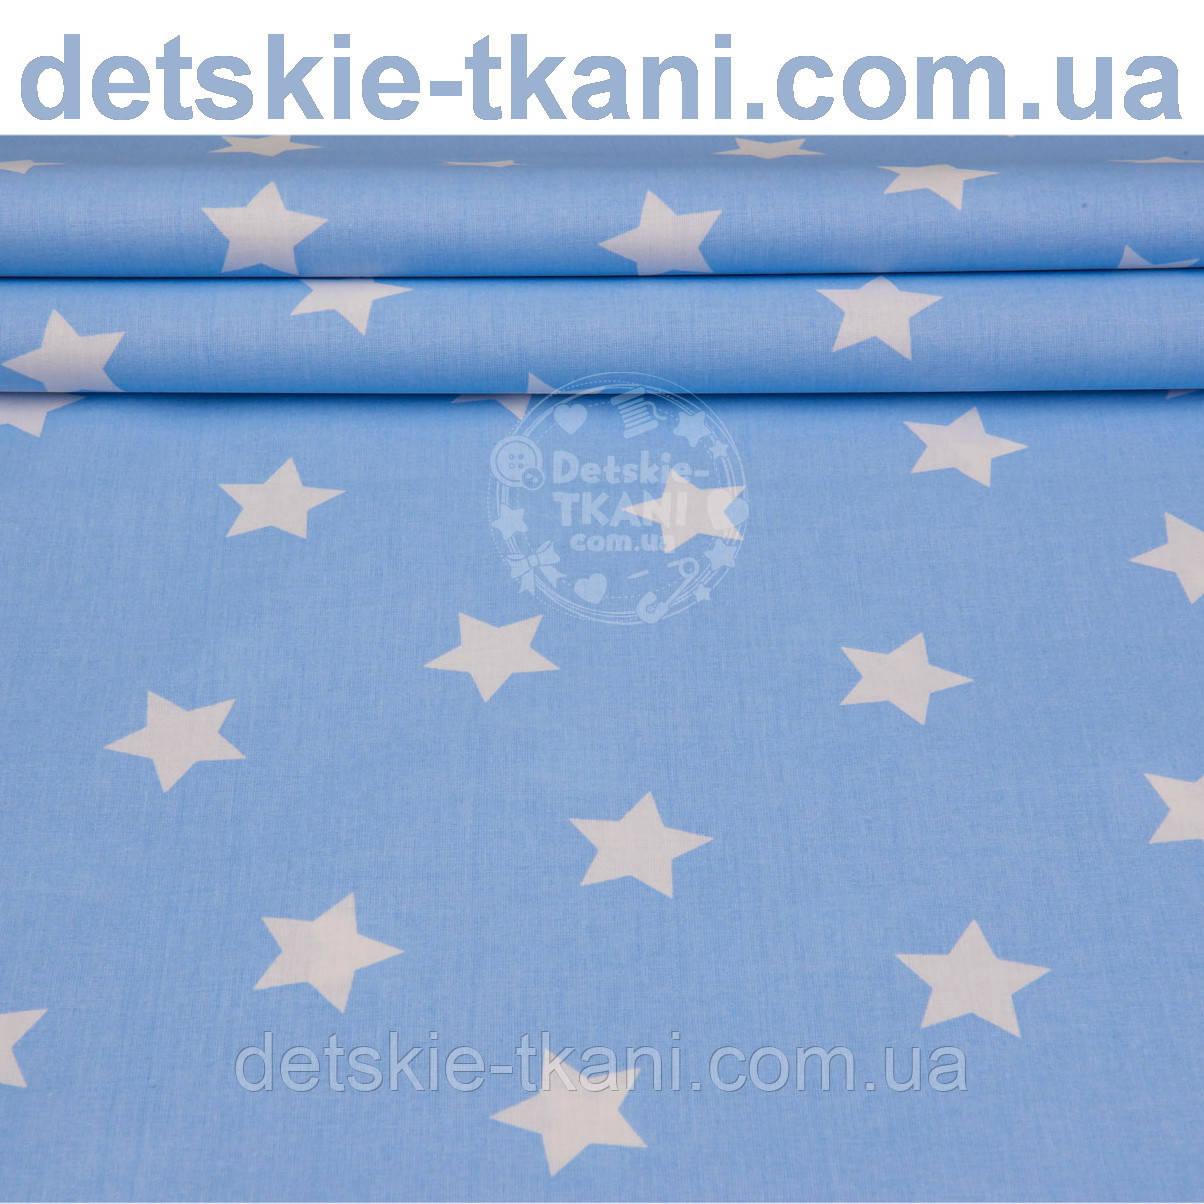 Отрез ранфорса с белыми звёздами 3 см на голубом фоне, ширина 240 см (№1115), размер 60*240